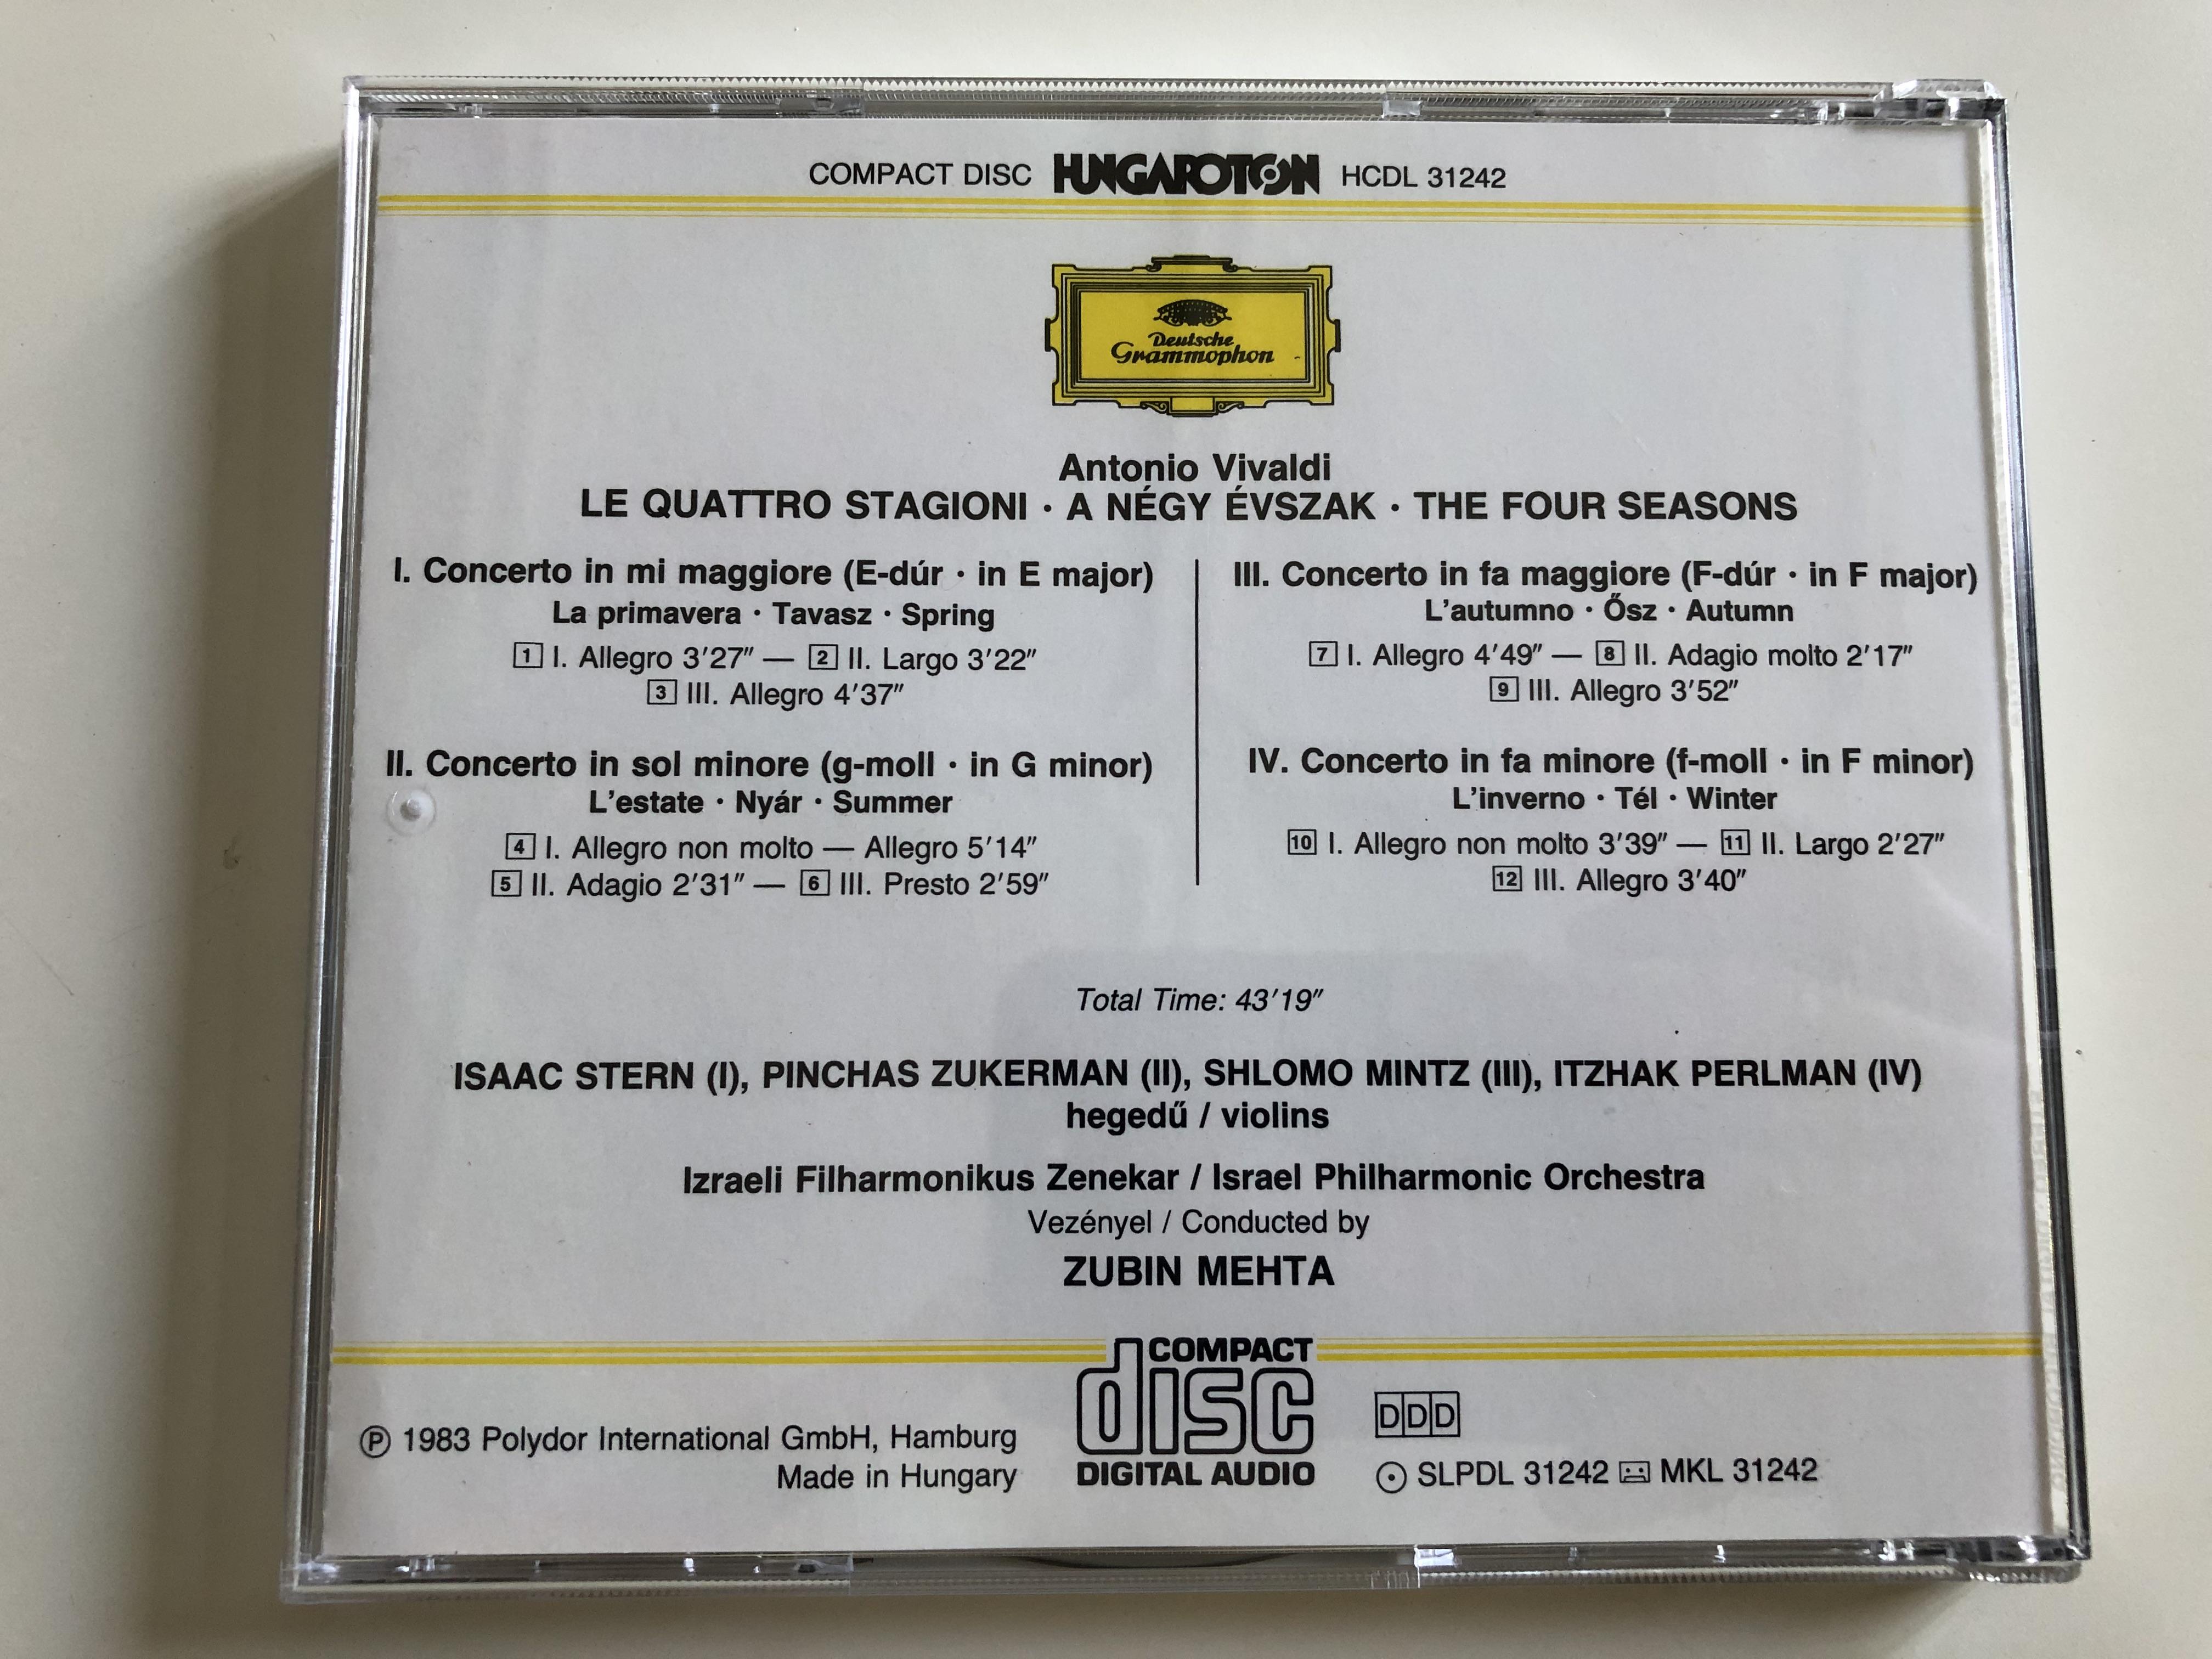 antonio-vivaldi-le-quattro-stagioni-the-four-seasons-stern-zukerman-mintz-perlman-israel-philharmonic-orchestra-conducted-by-zubin-mehta-hungaroton-audio-cd-1983-hcdl-31242-6-.jpg